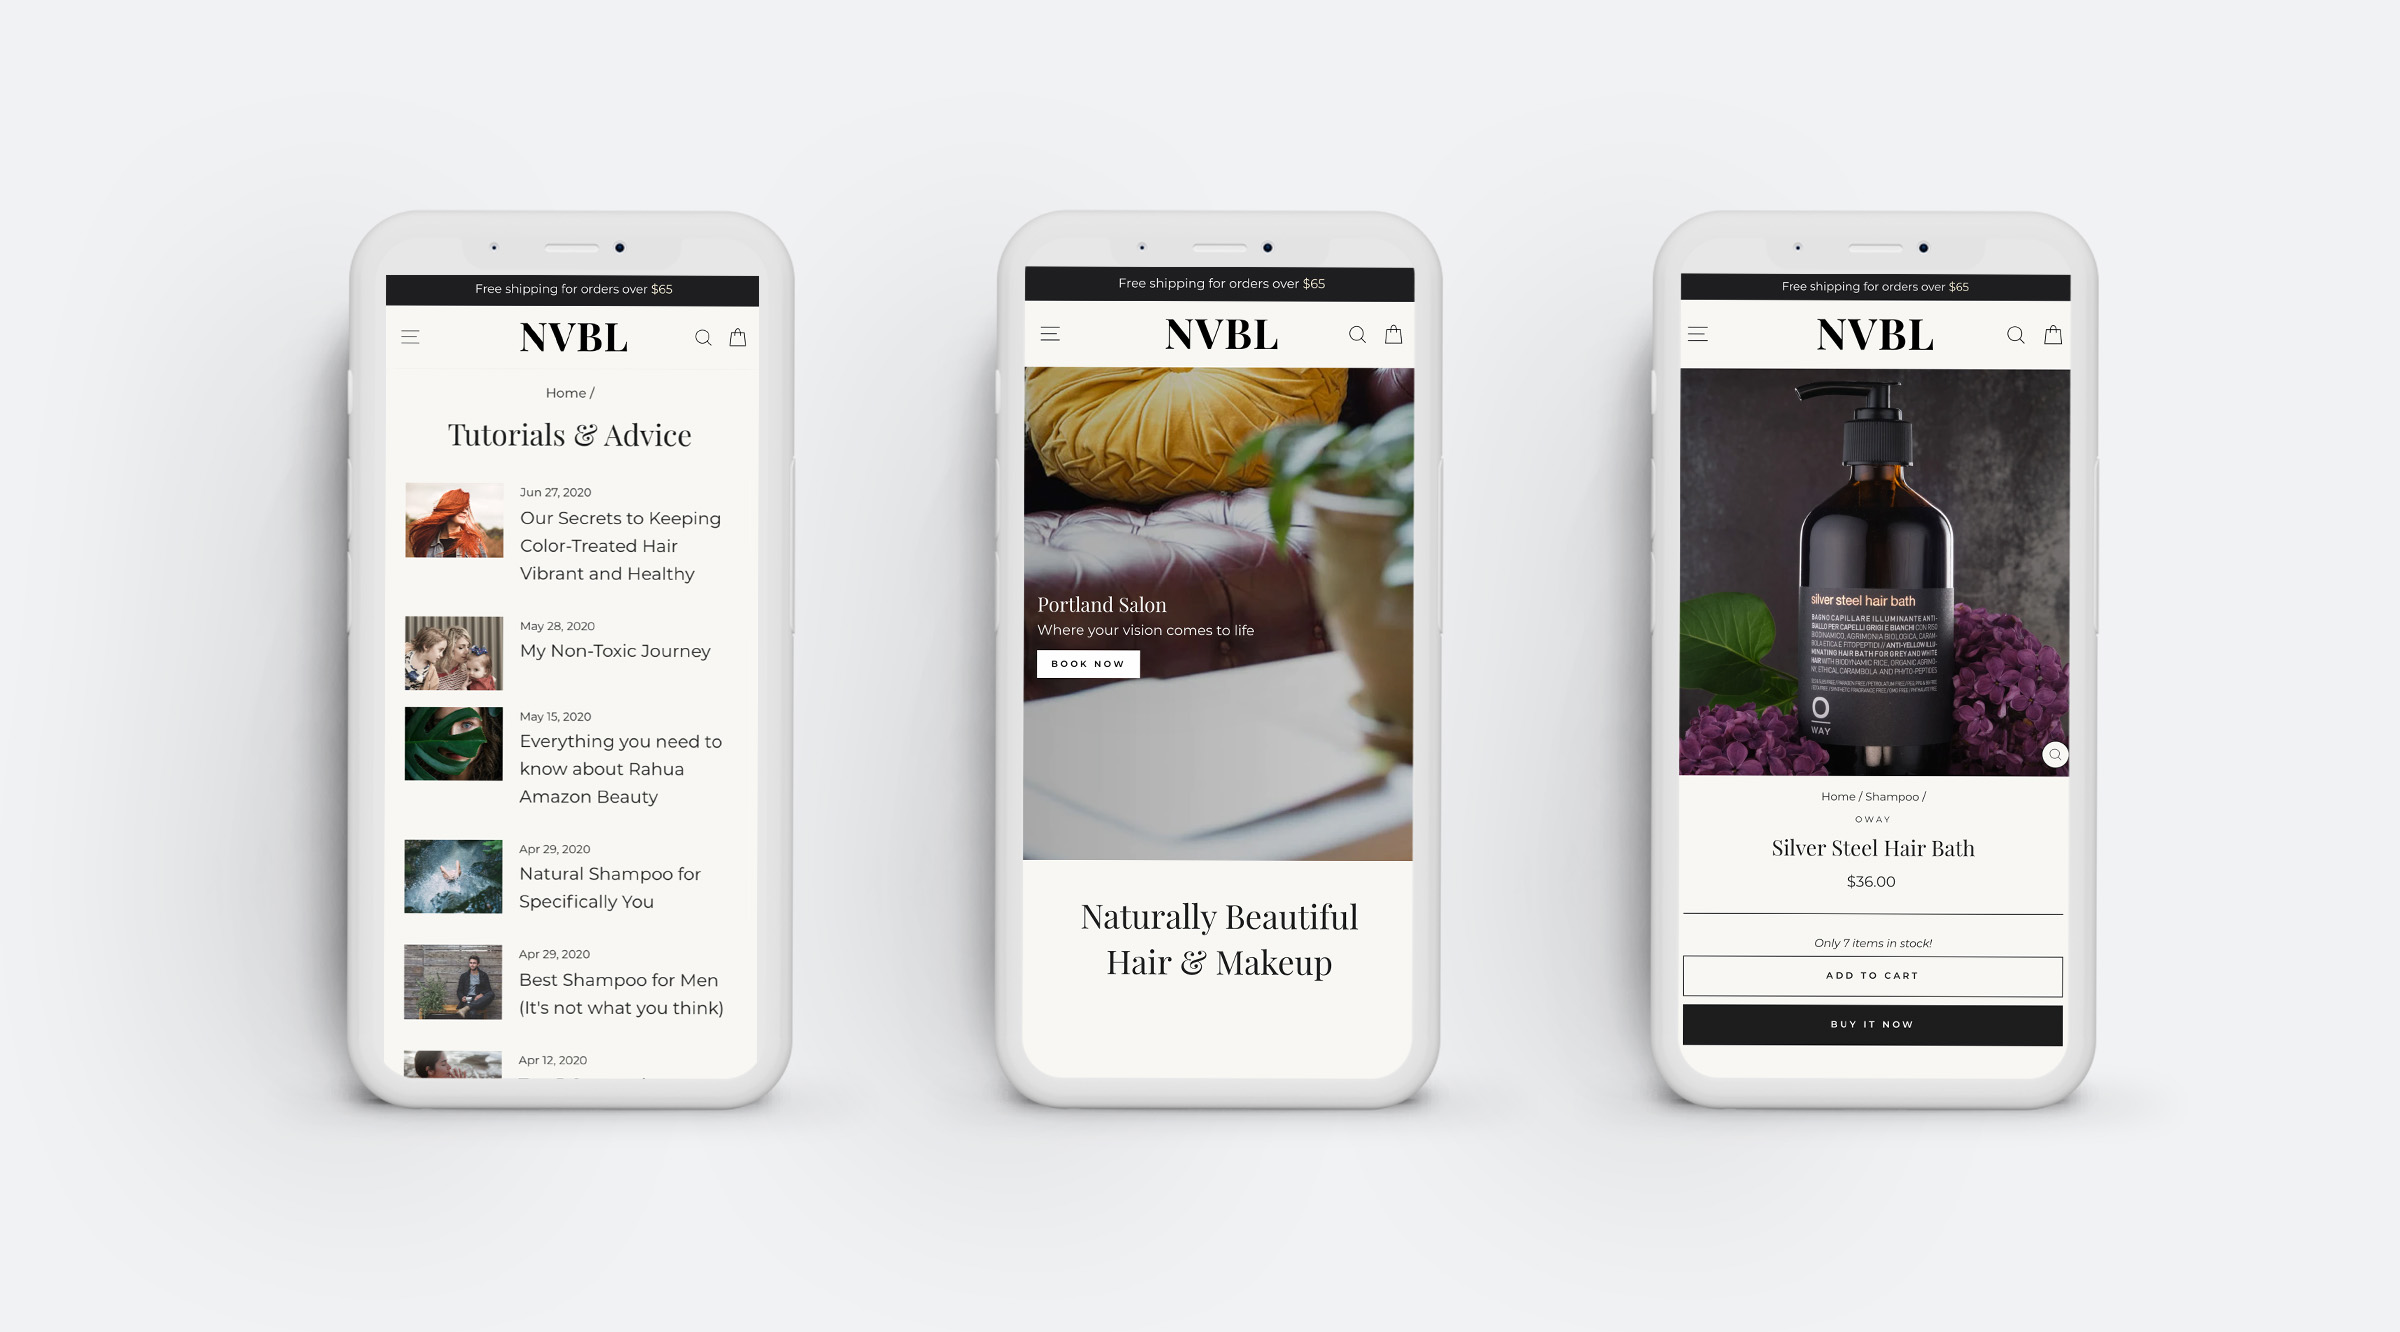 nvbl mobile e commerce design